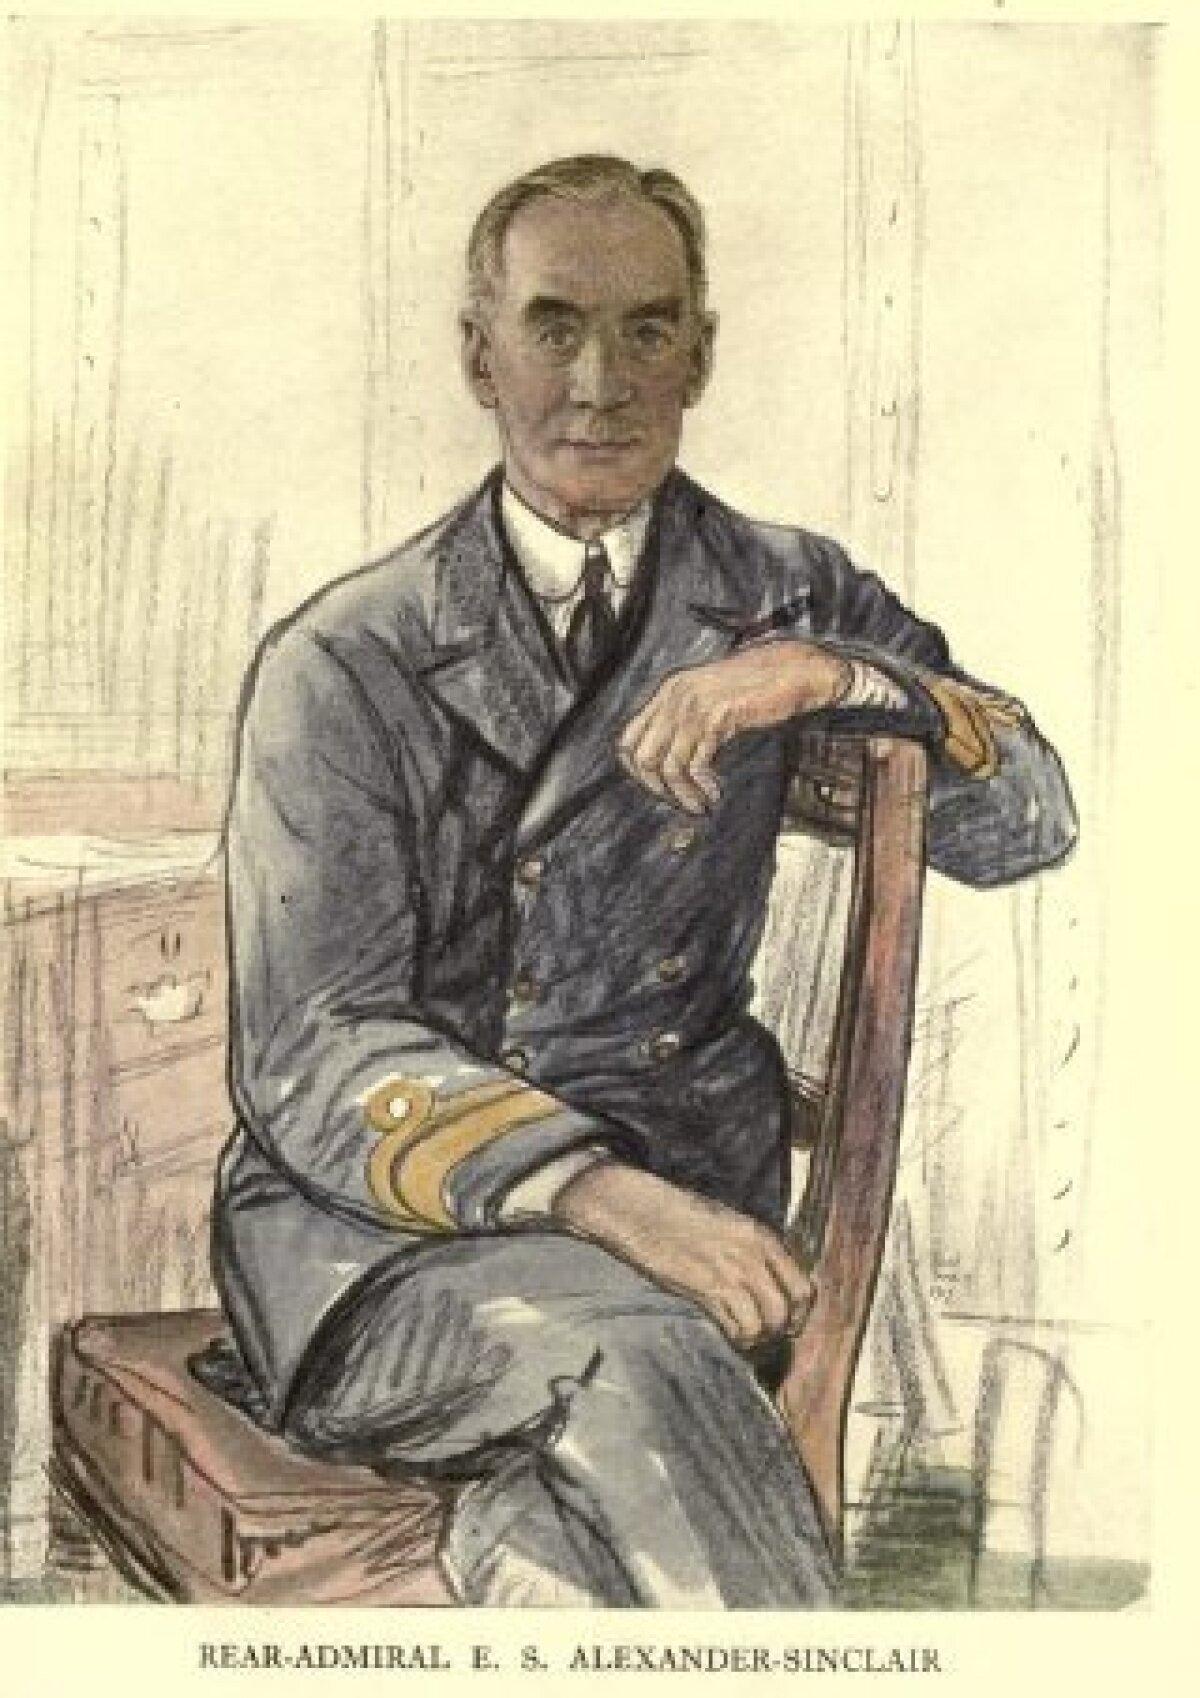 Kontradmiral Edwyn Sinclair Alexander-Sinclair (1865-1945). Portree autoriks Francis Dodd (1874-1949).